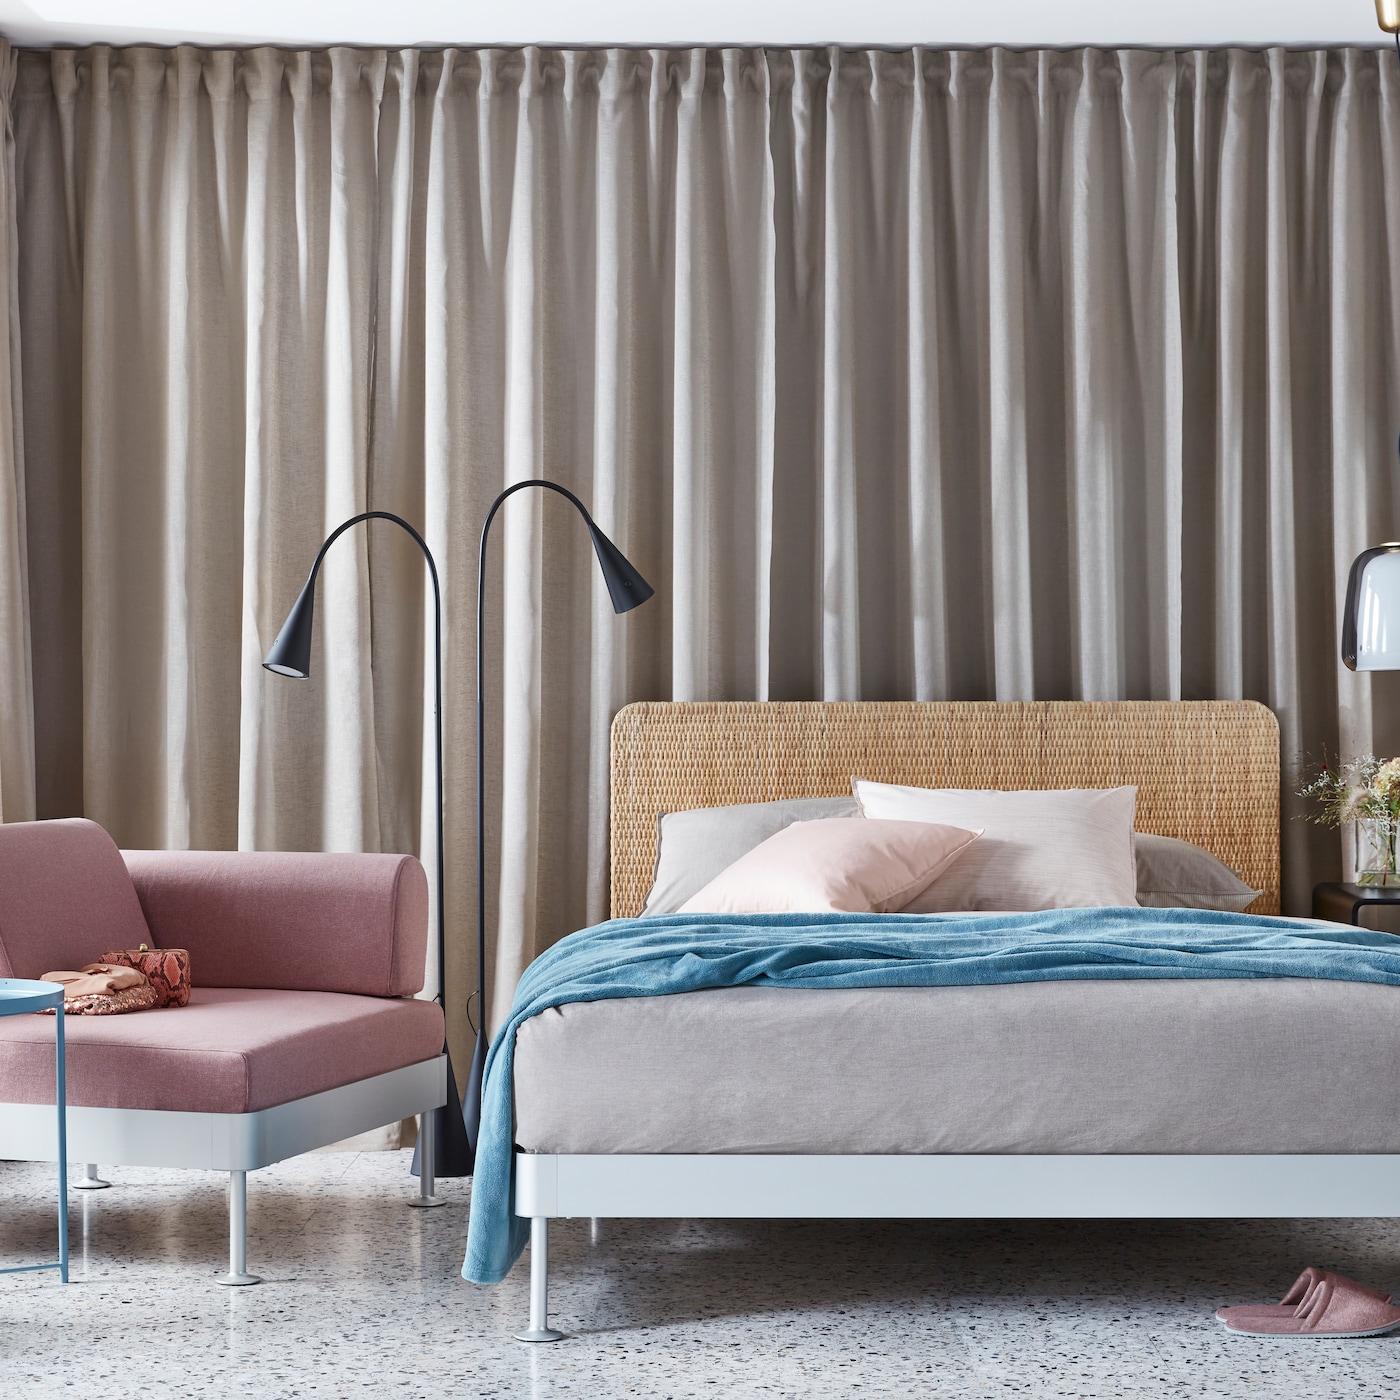 jetzt bei ikea ikea. Black Bedroom Furniture Sets. Home Design Ideas